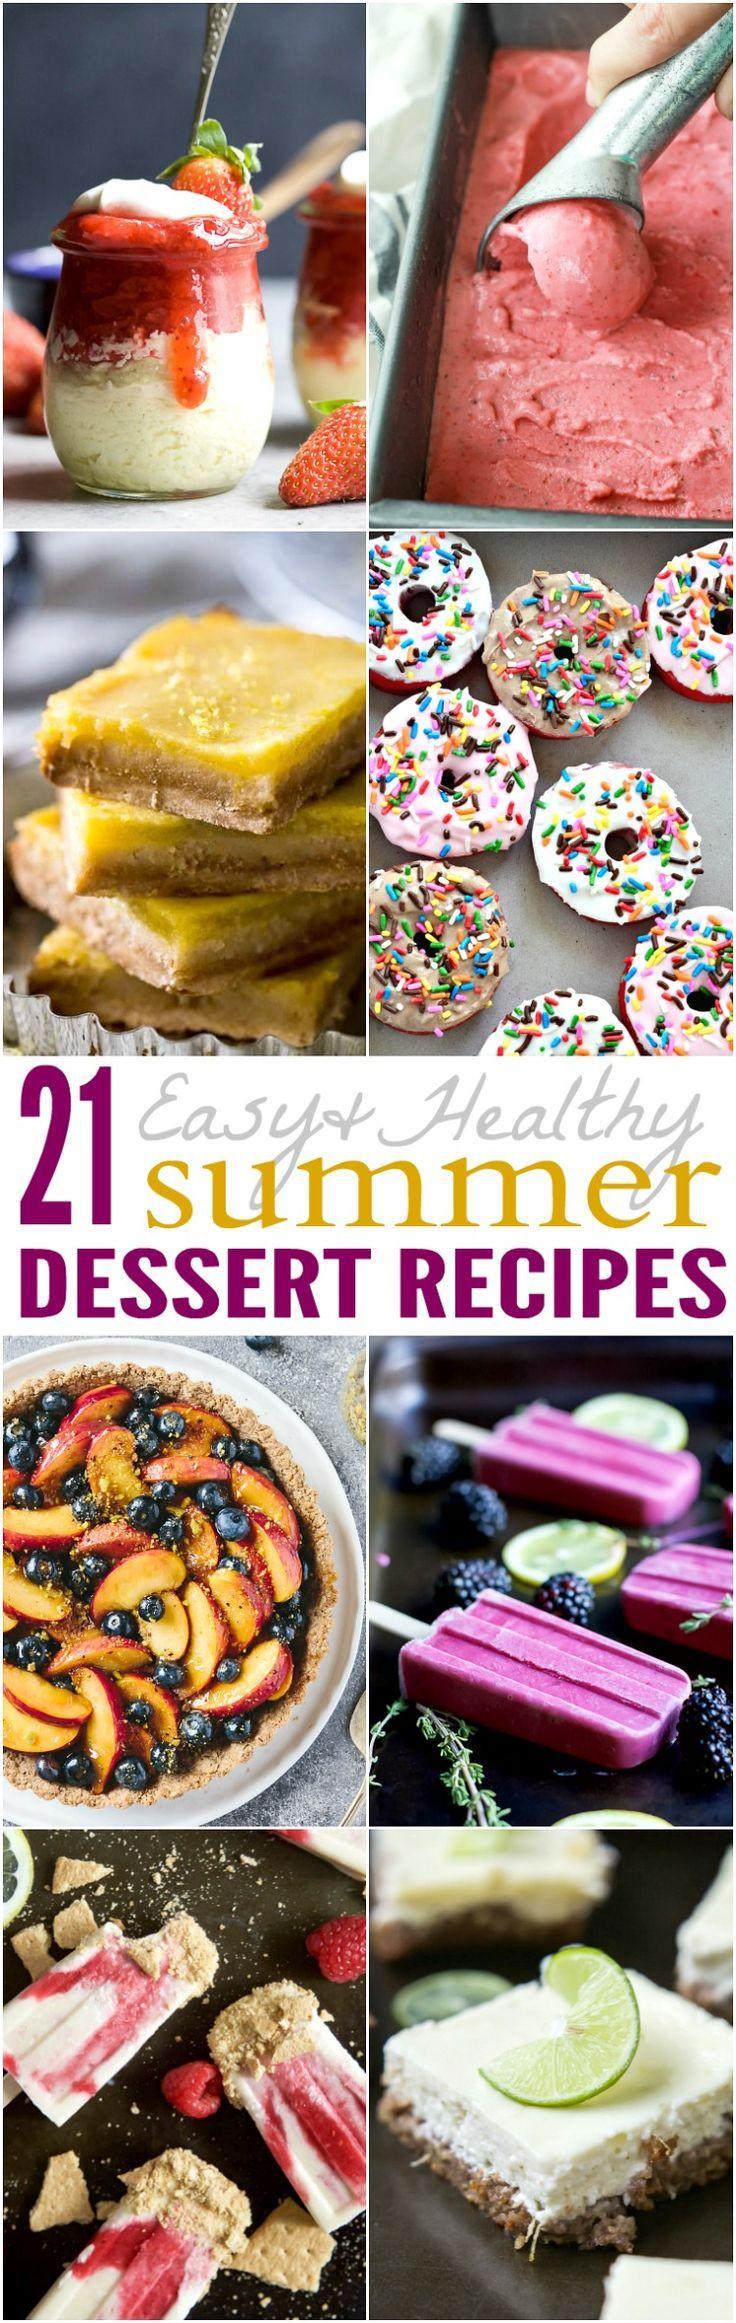 Summertime Snacks Recipe  Best 25 Healthy summer snacks ideas on Pinterest